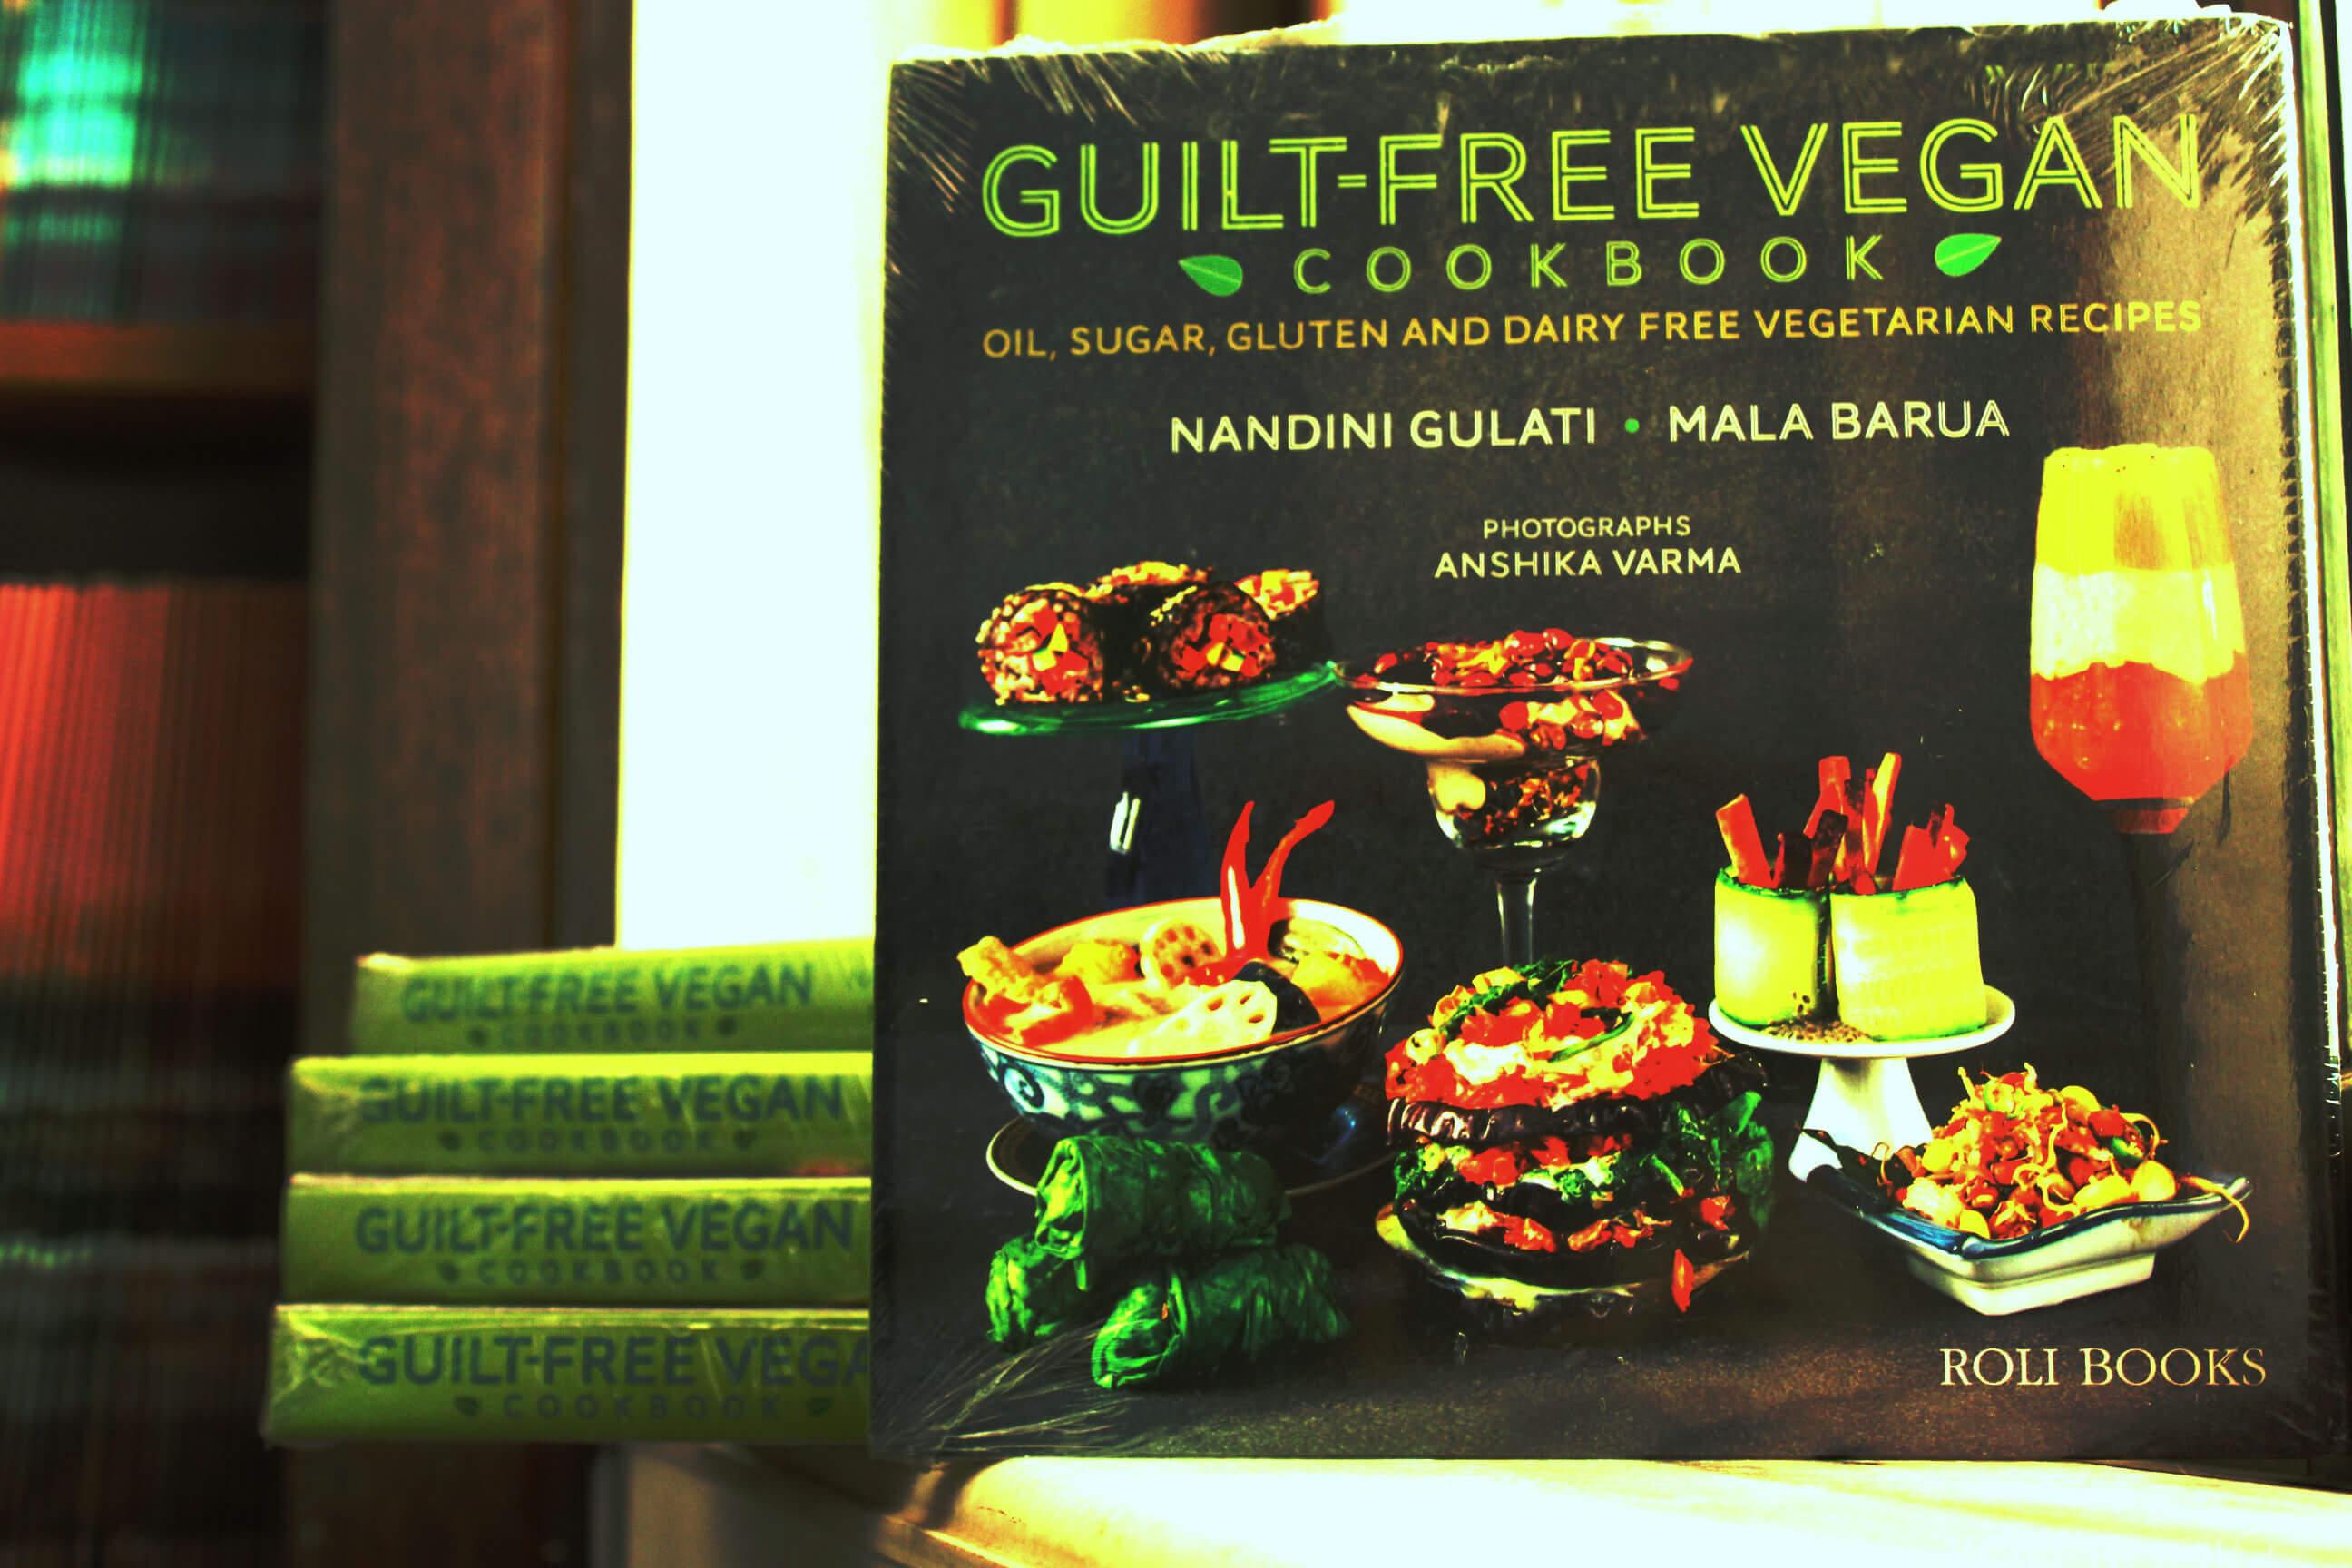 Guilt-free vegan contest thumbnail